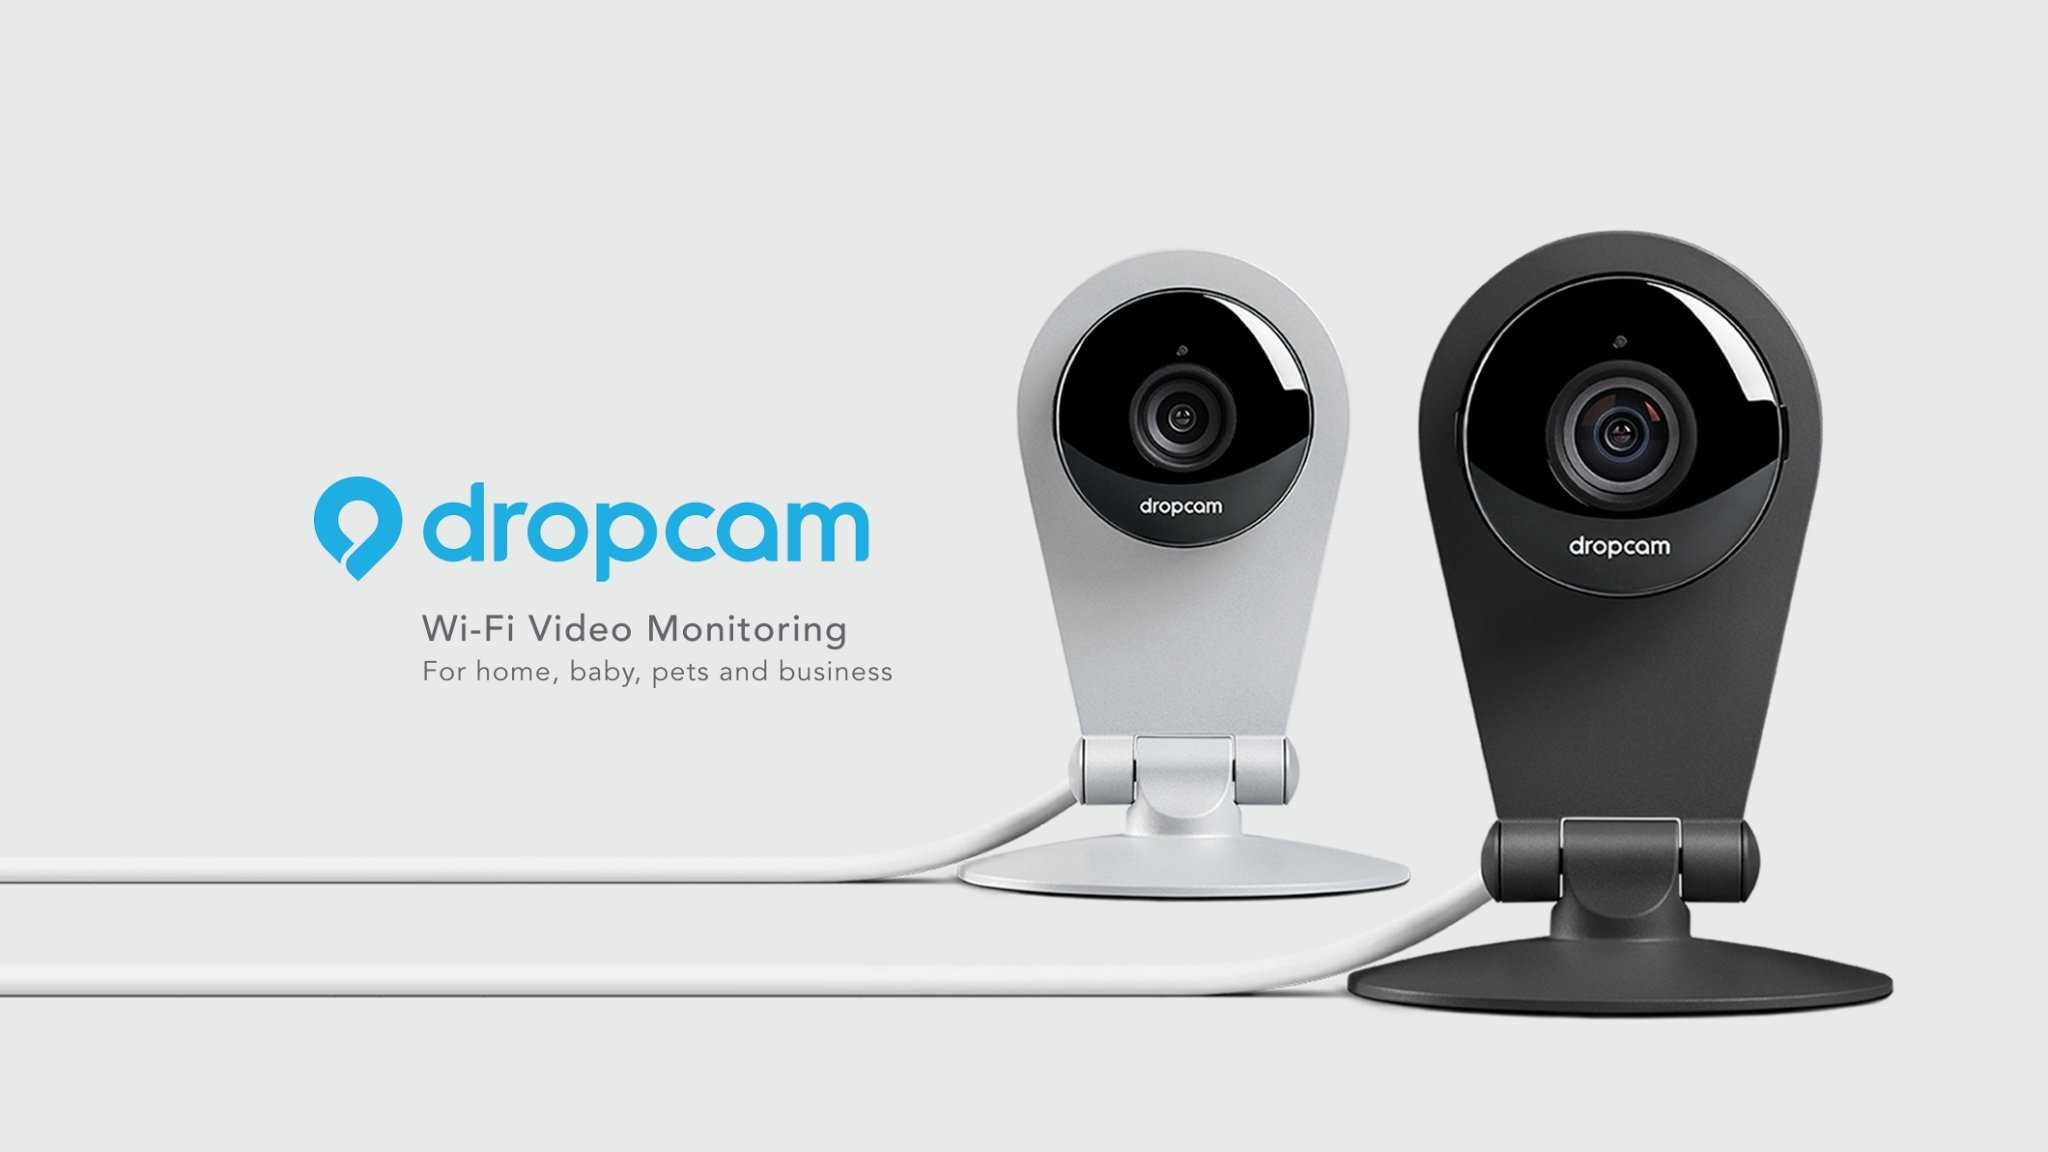 Dropcam image